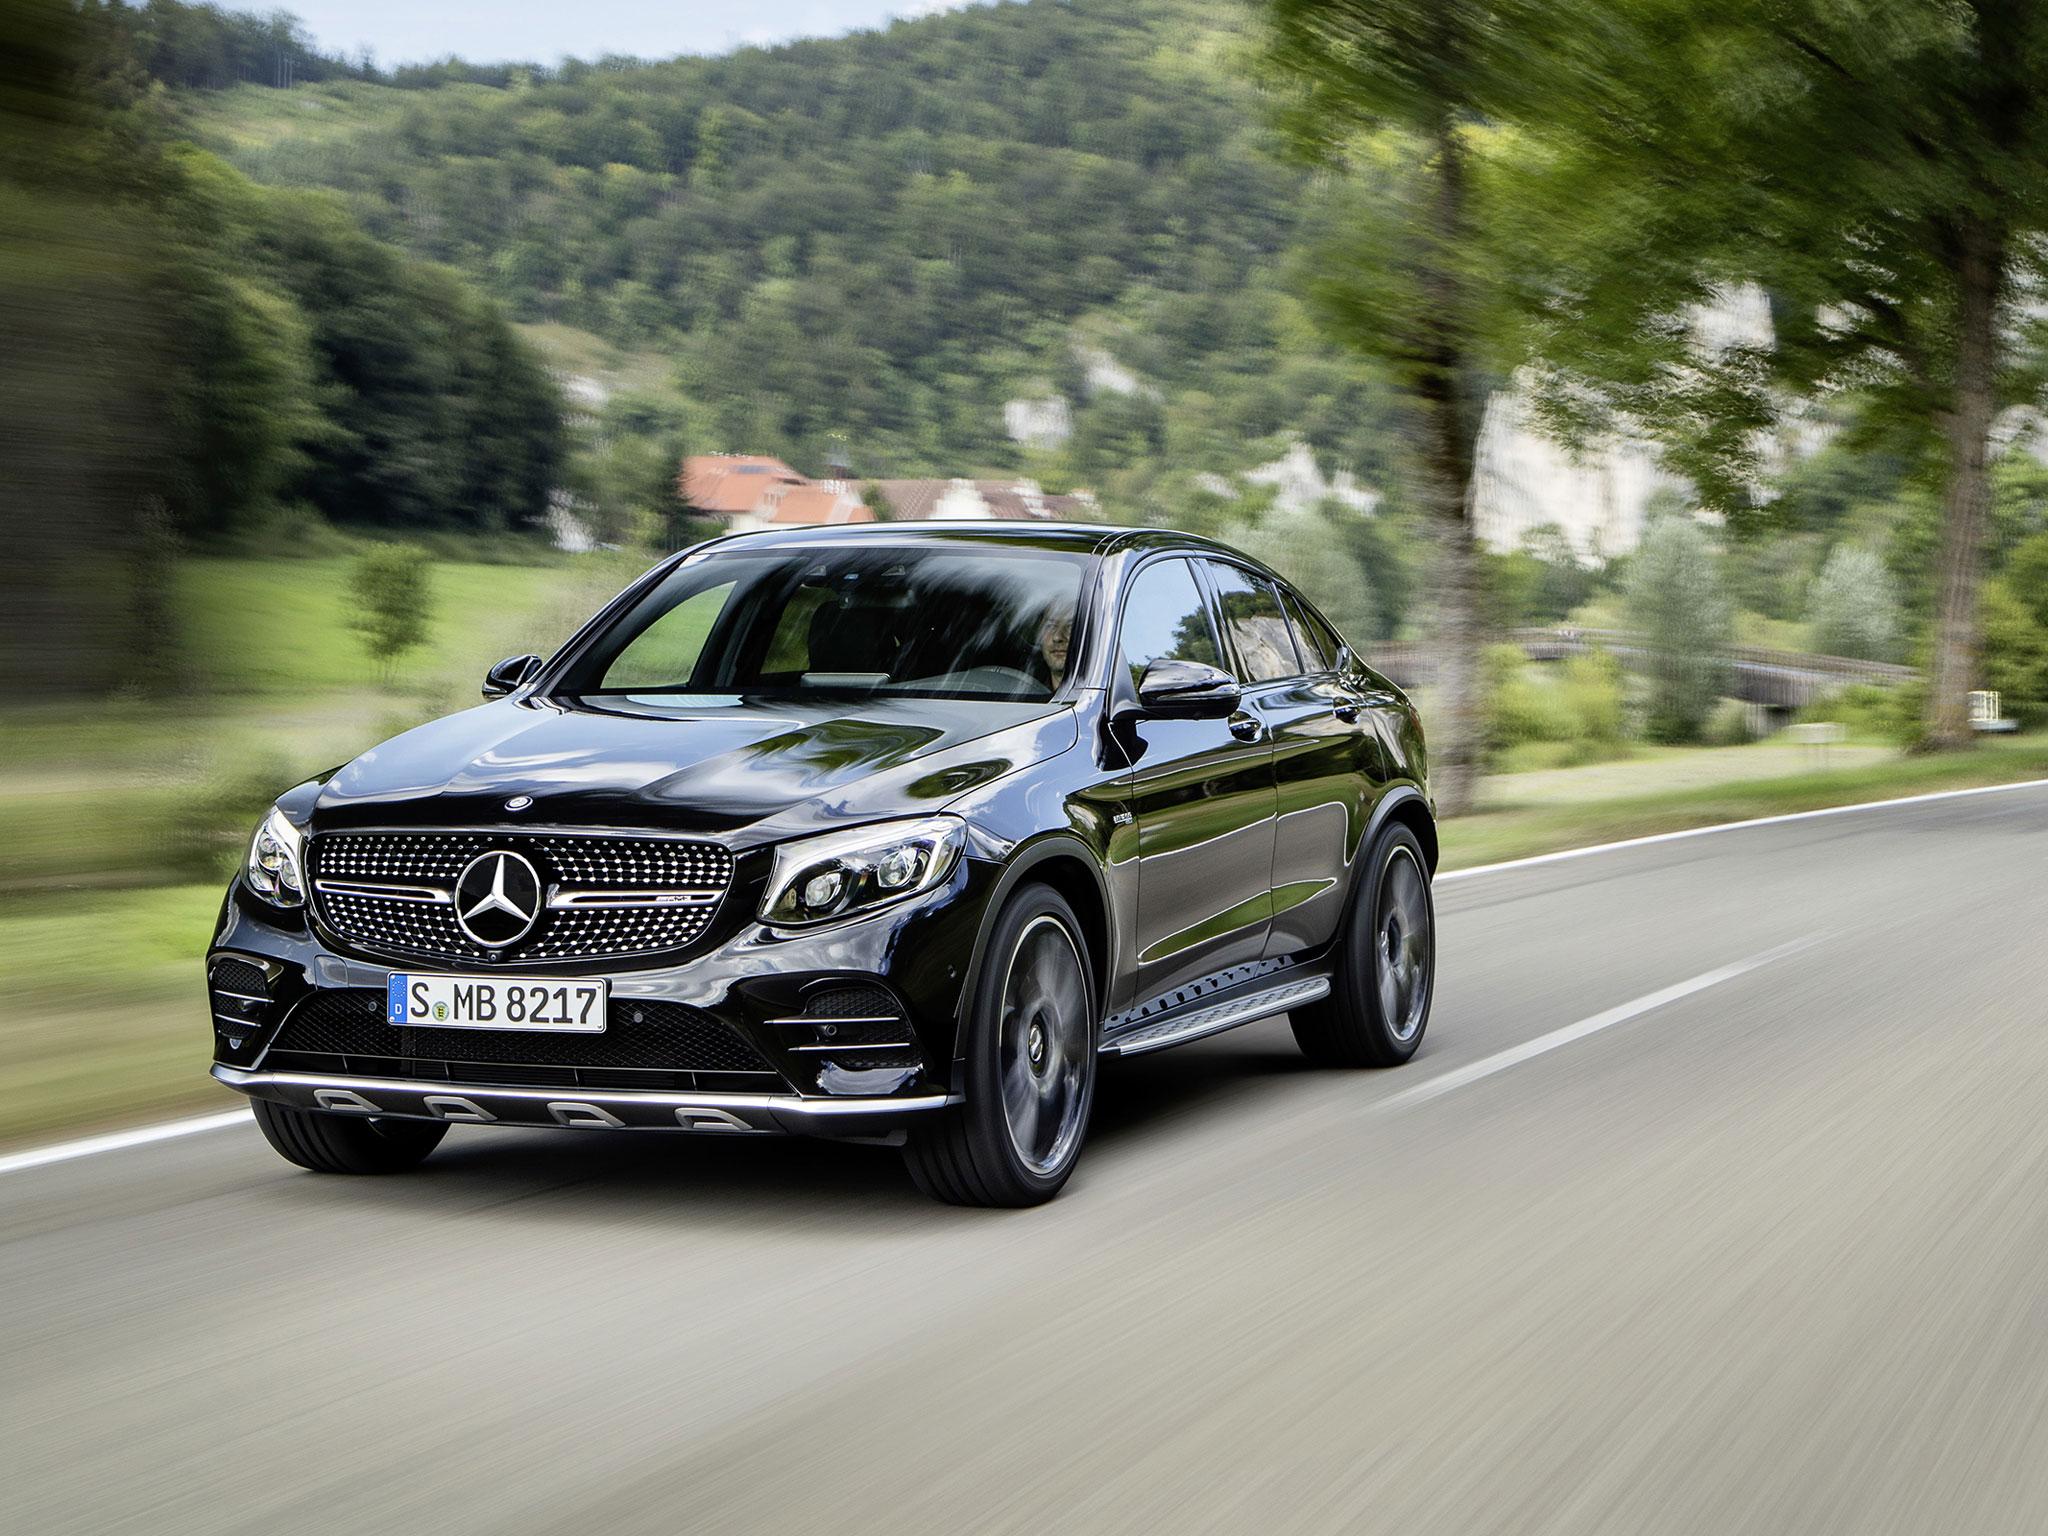 Mercedes Benz Home of C E S CLS CL SLK SL R GLK M GL G